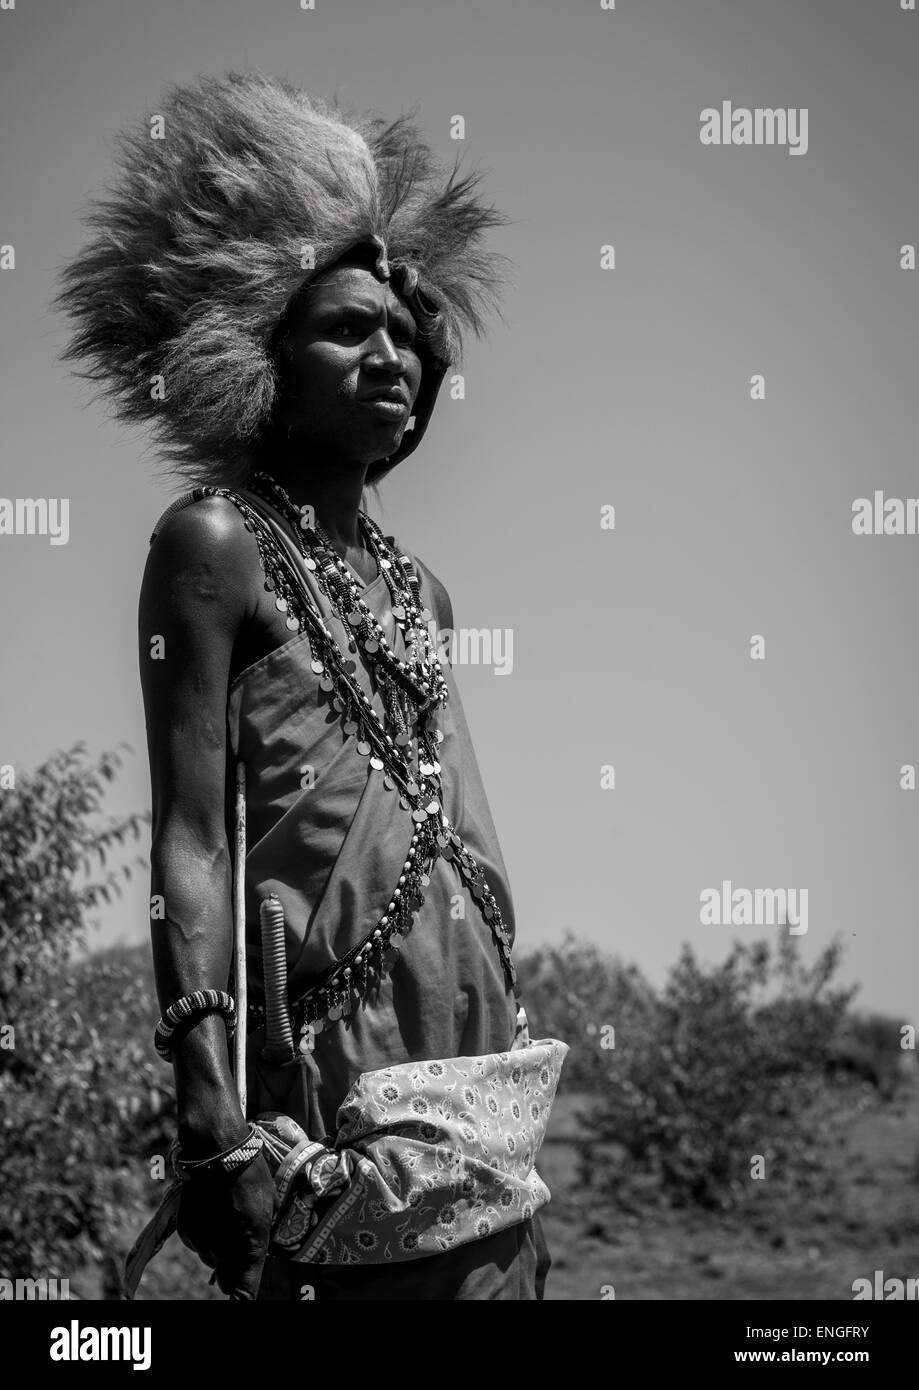 Maasai Warrior With A Lion Hat Fur On The Head, Nakuru County, Nakuru, Kenya - Stock Image